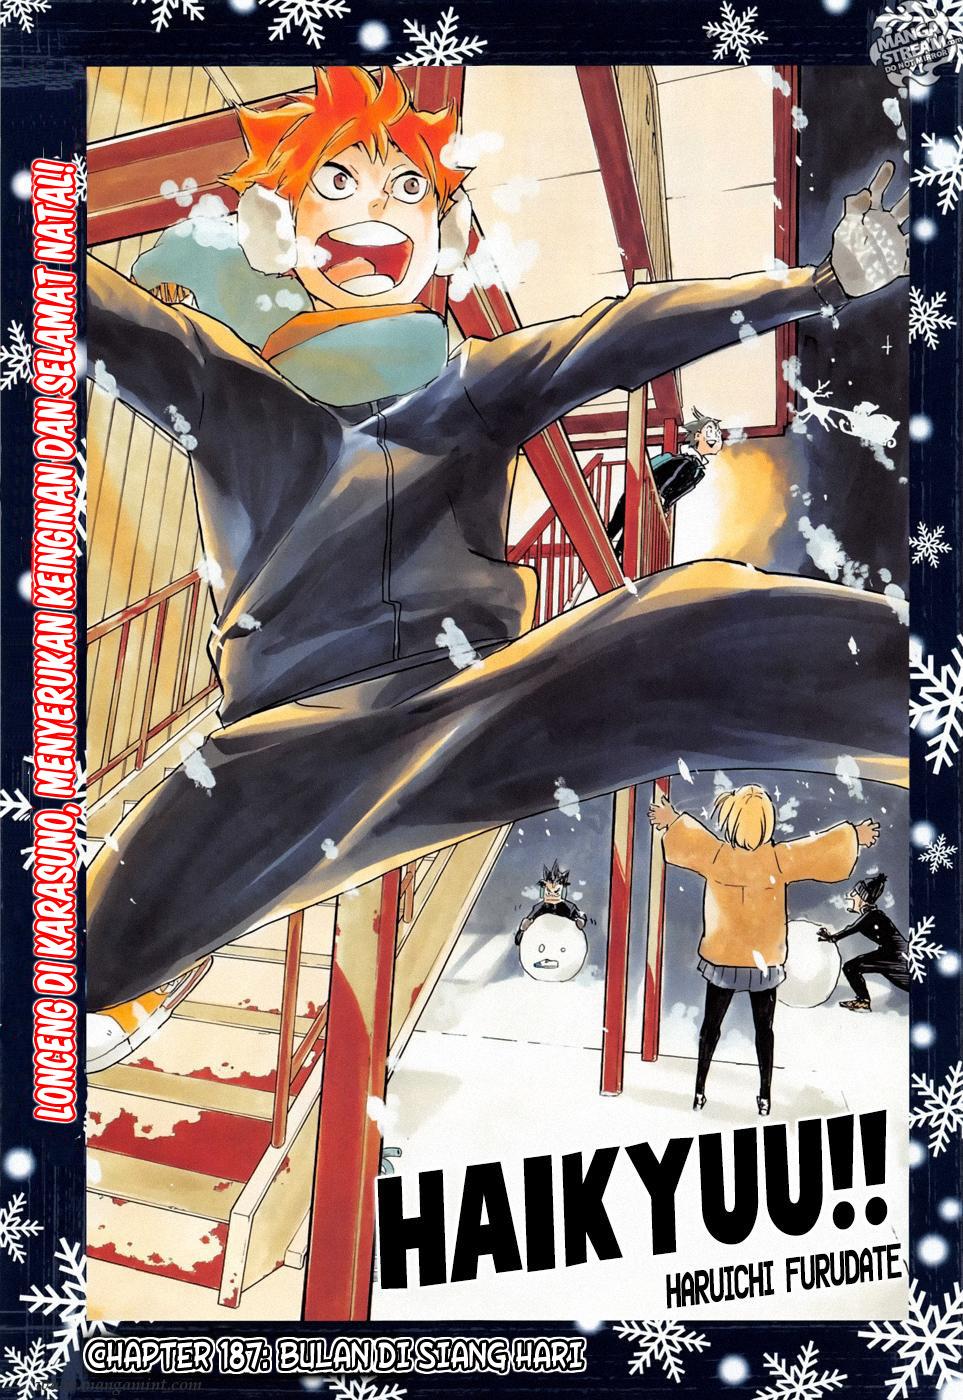 Dilarang COPAS - situs resmi www.mangacanblog.com - Komik haikyuu 187 - bulan di siang hari 188 Indonesia haikyuu 187 - bulan di siang hari Terbaru 1|Baca Manga Komik Indonesia|Mangacan